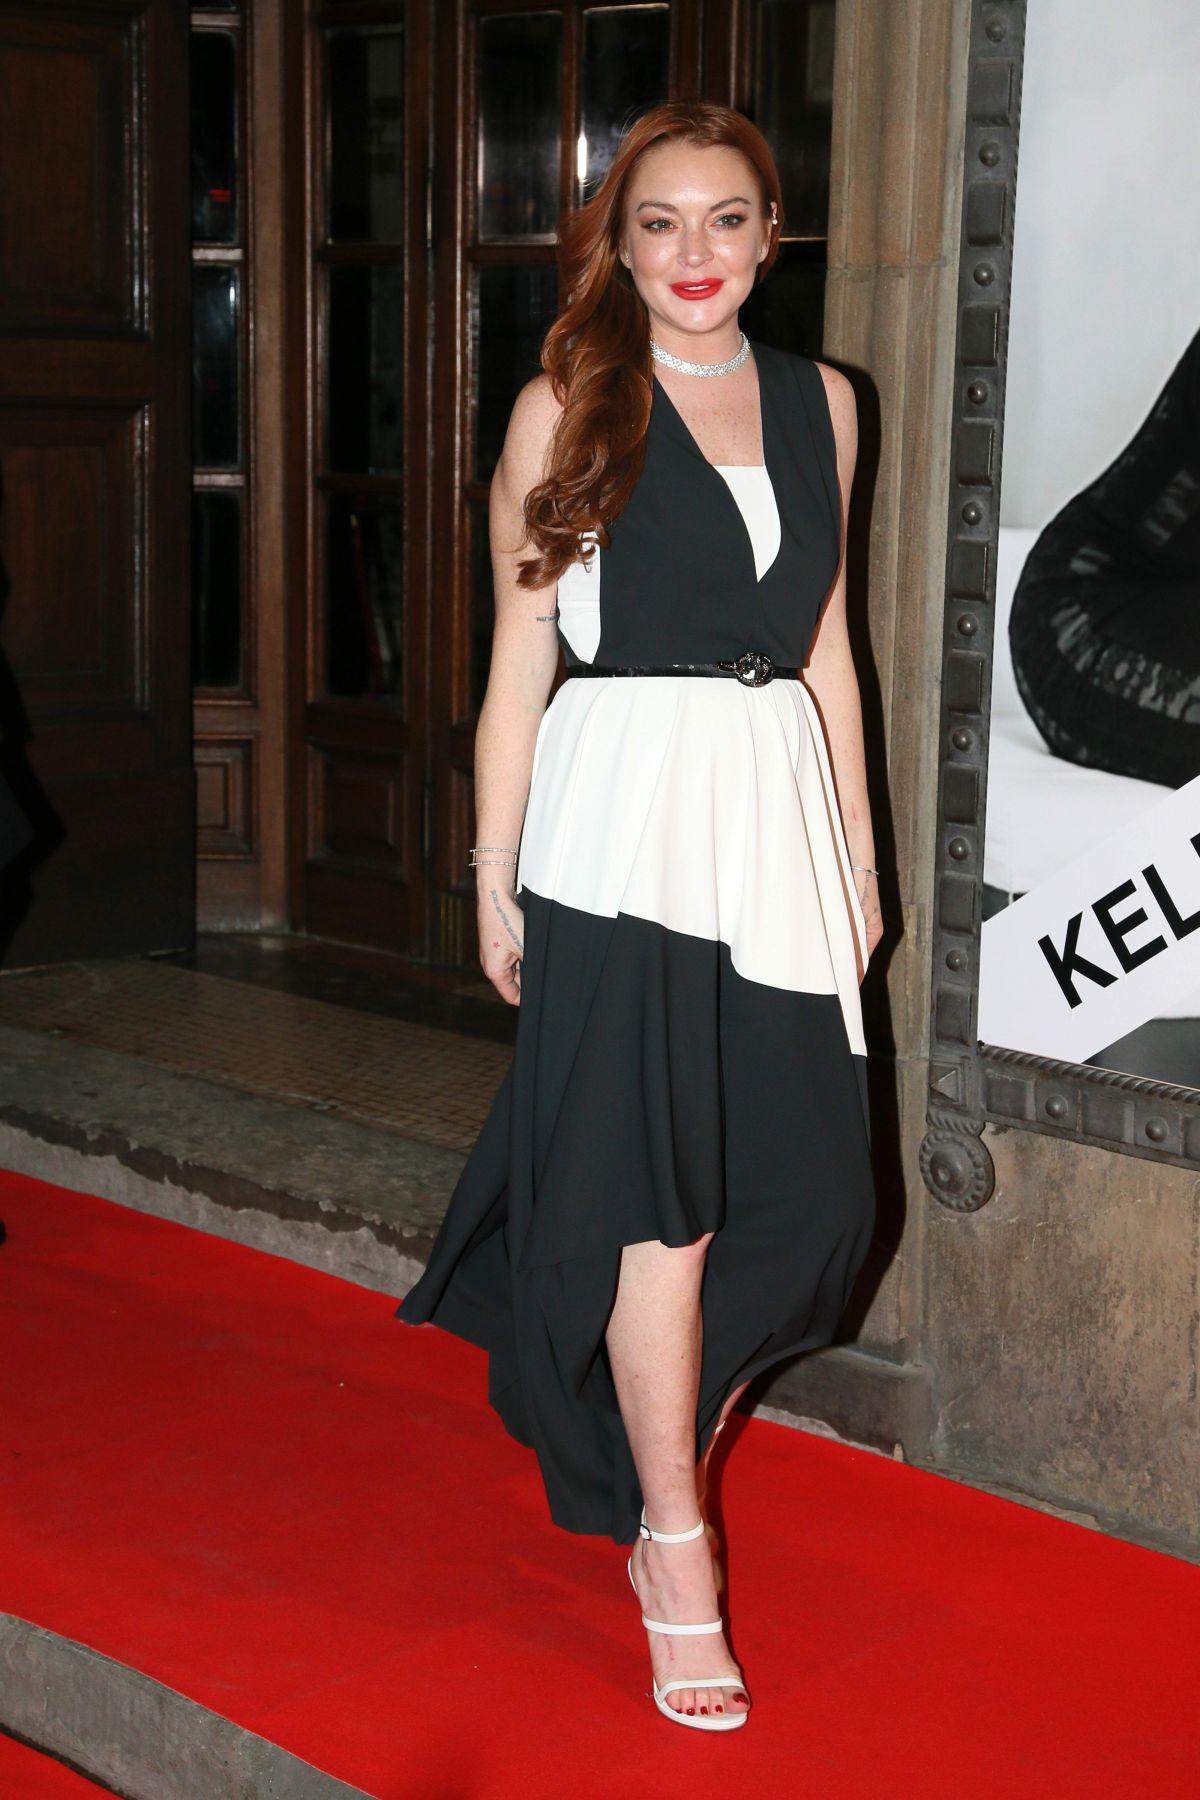 LINDSAY LOHAN at luisaviaroma firenze4ever Fashion, Music ... Lindsay Lohan 2017